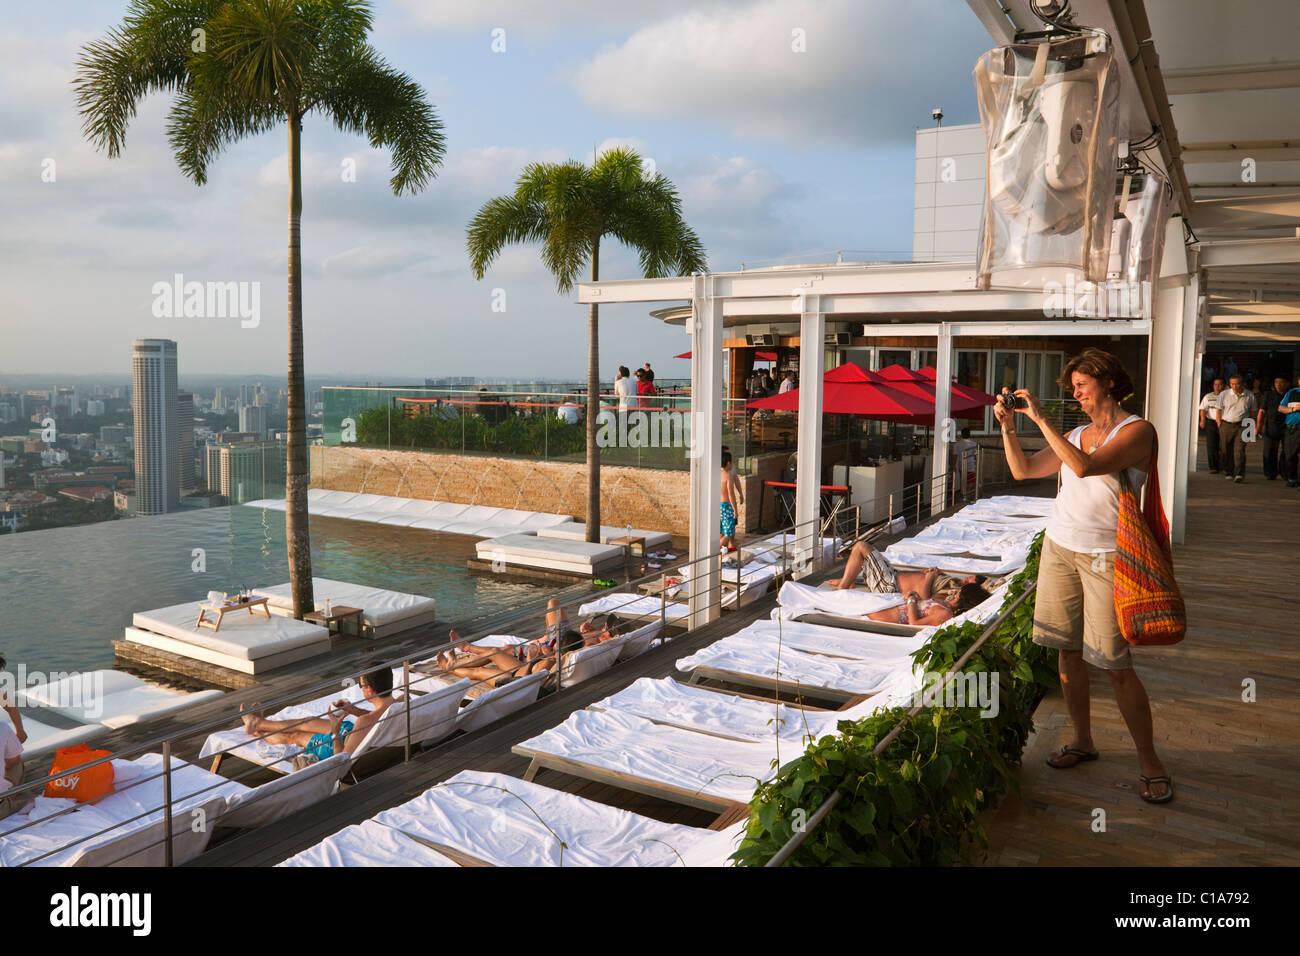 Woman photographing the swimming pool at the Marina Bay Sands SkyPark.  Marina Bay, Singapore - Stock Image